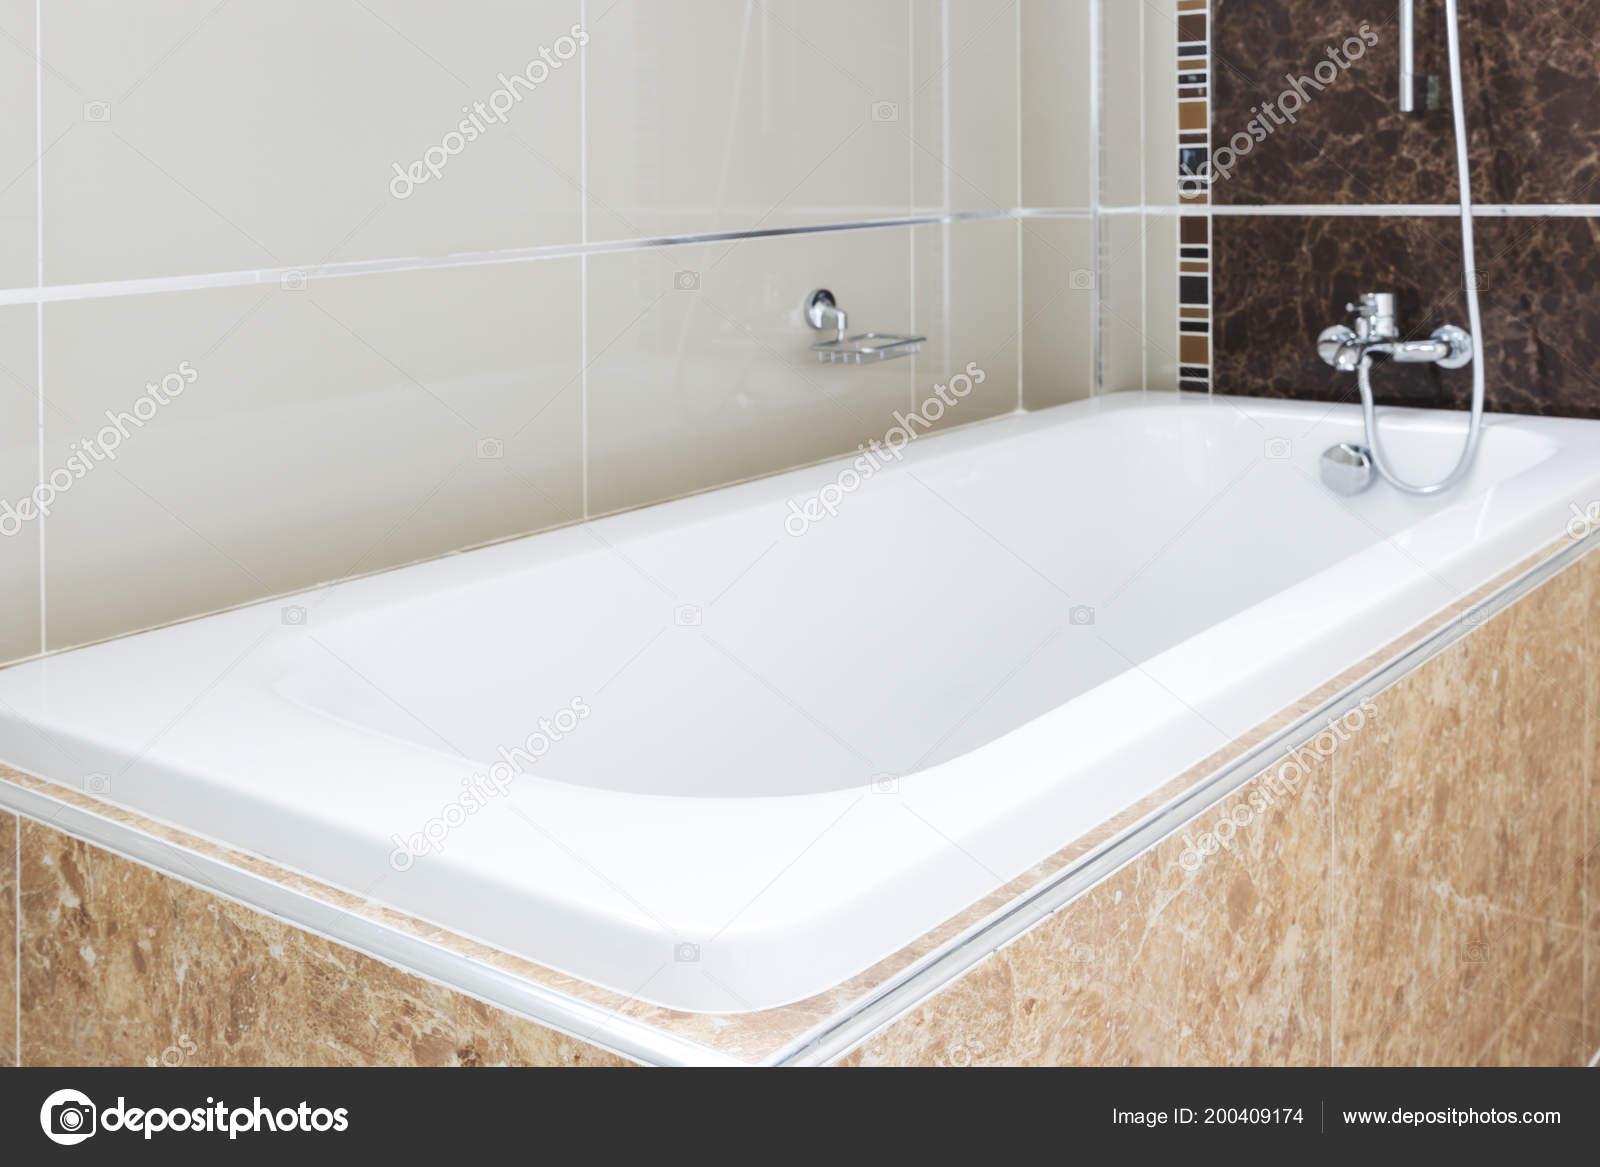 Vasche Da Bagno Design Moderno : Vasca bagno design moderno casa sfocatura bianco sanitari bagno